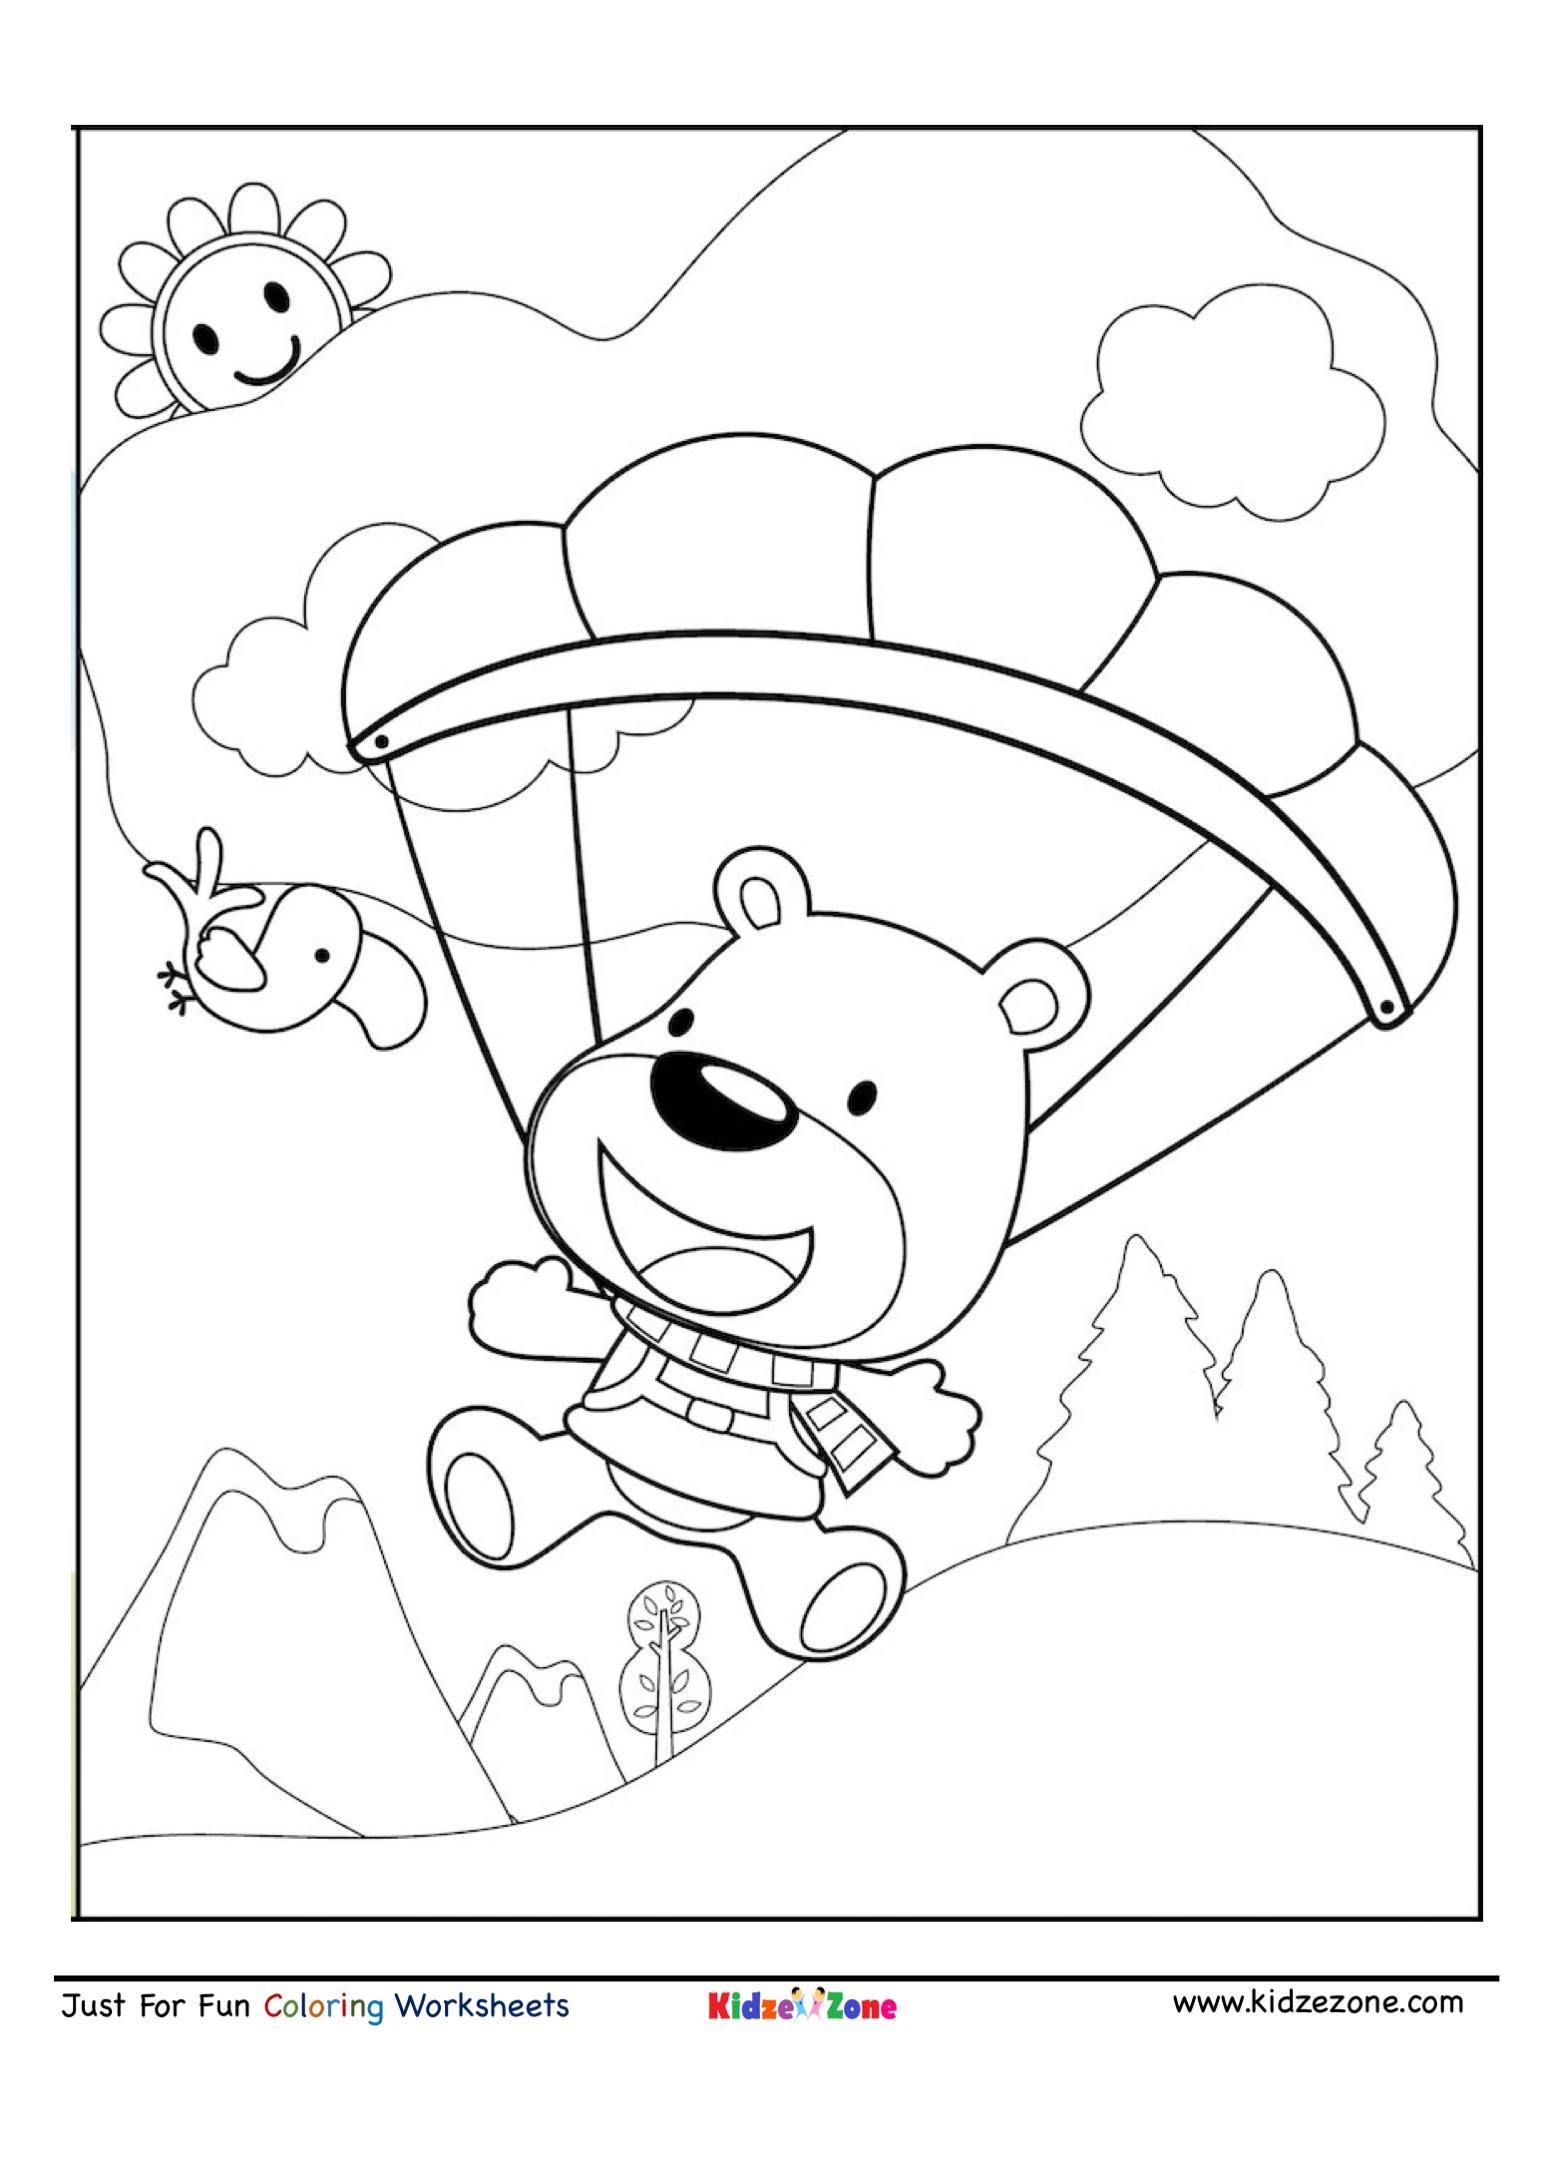 Bear Sky Diving Cartoon Coloring Page